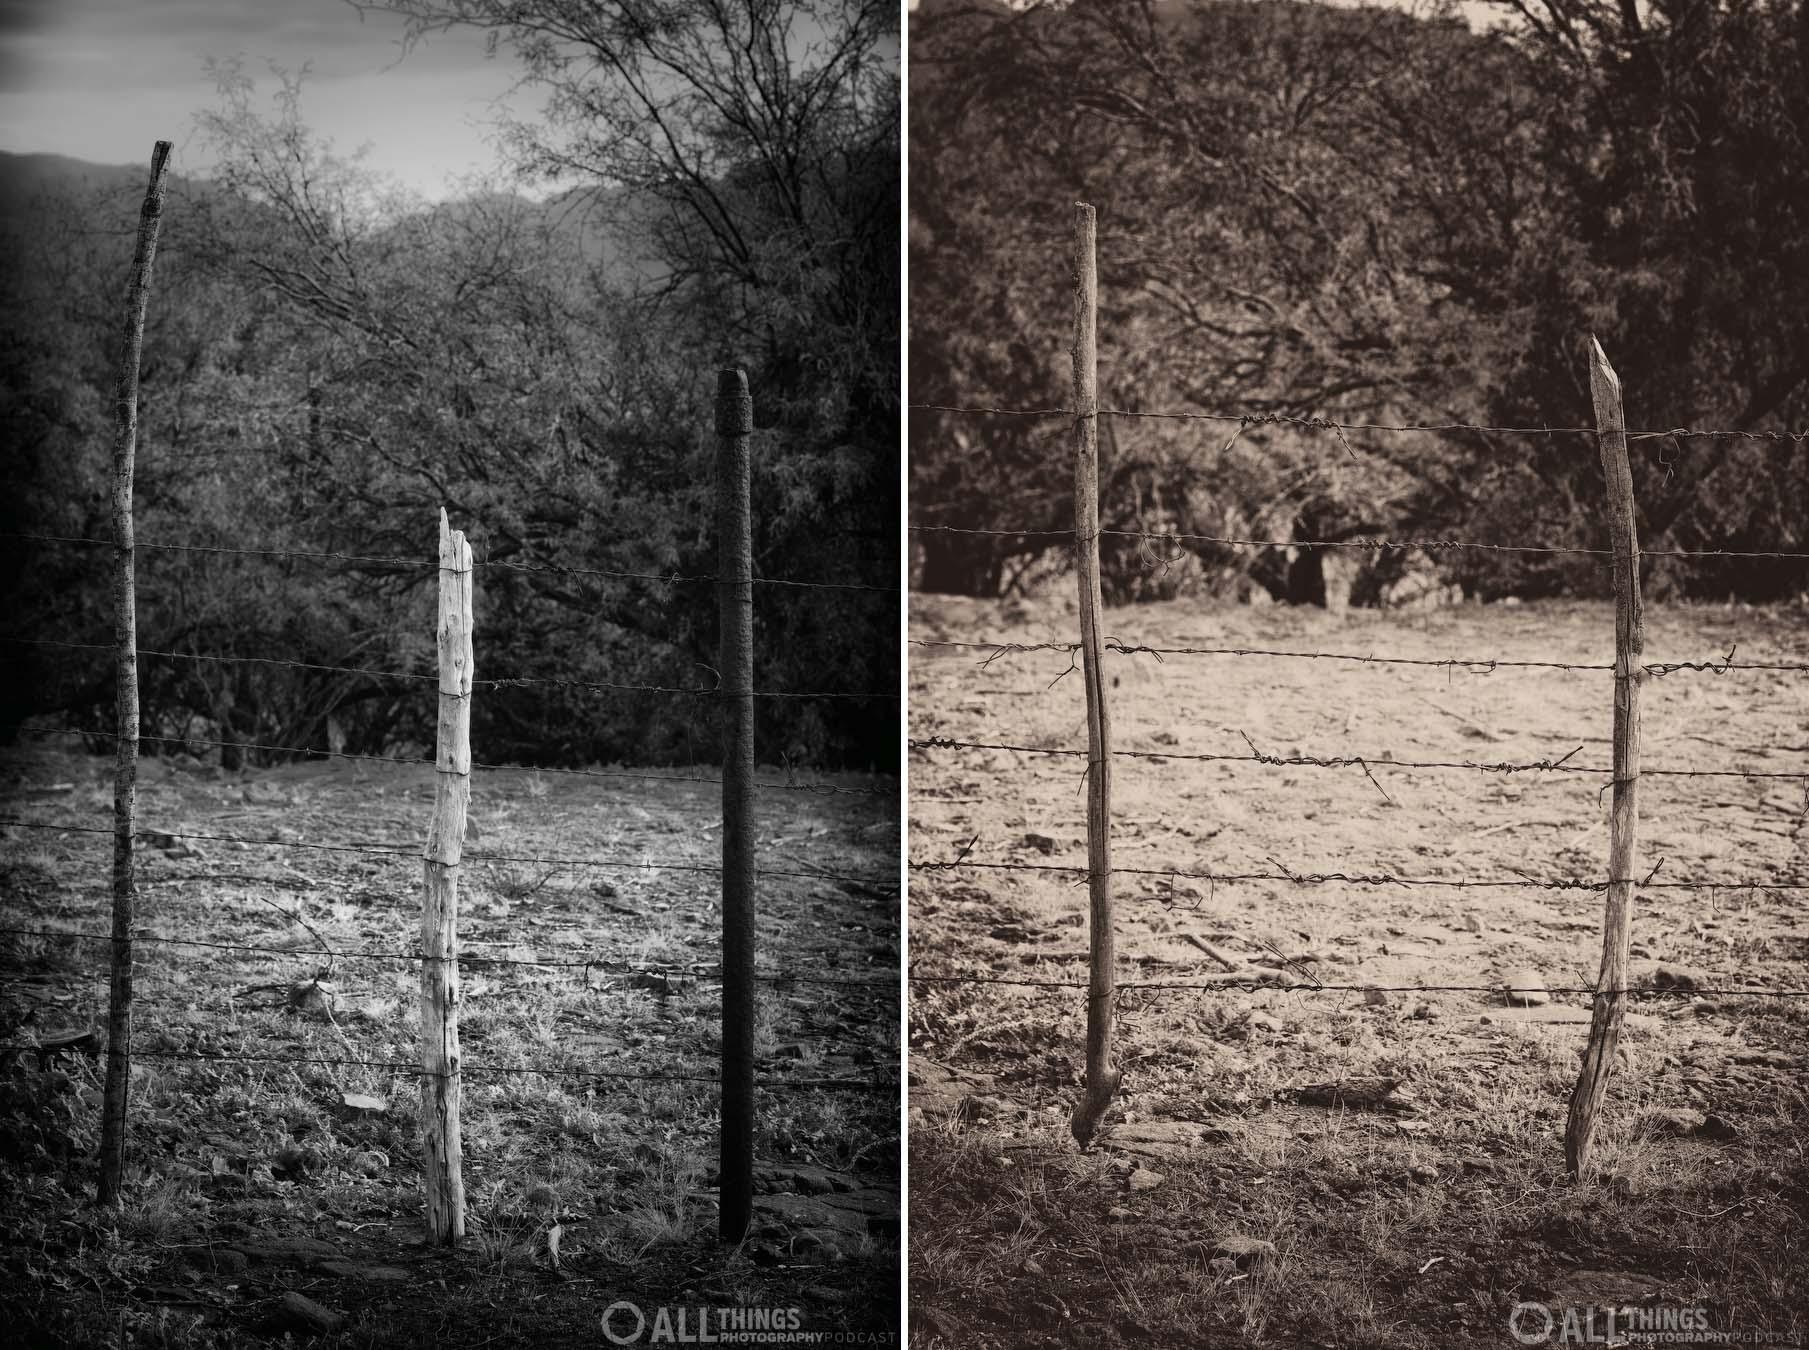 fences 3 & 2